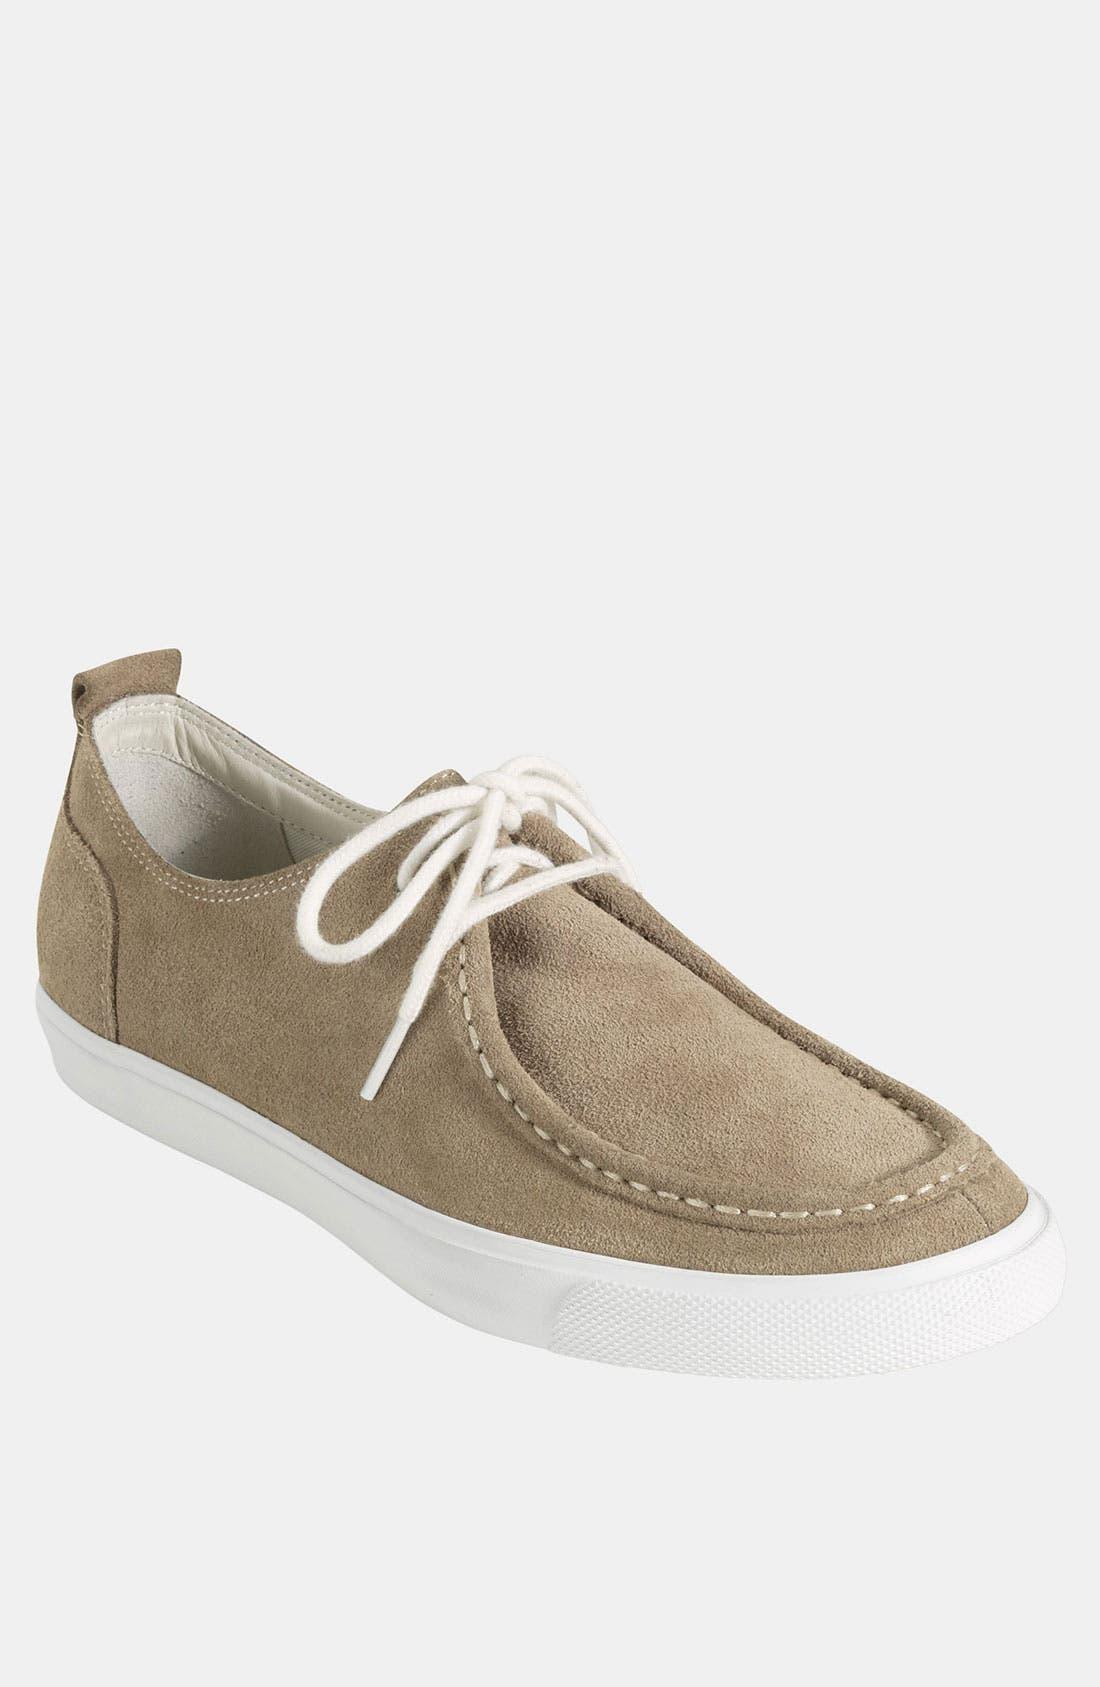 Main Image - Cole Haan 'Air Newport' Moc-Toe Sneaker